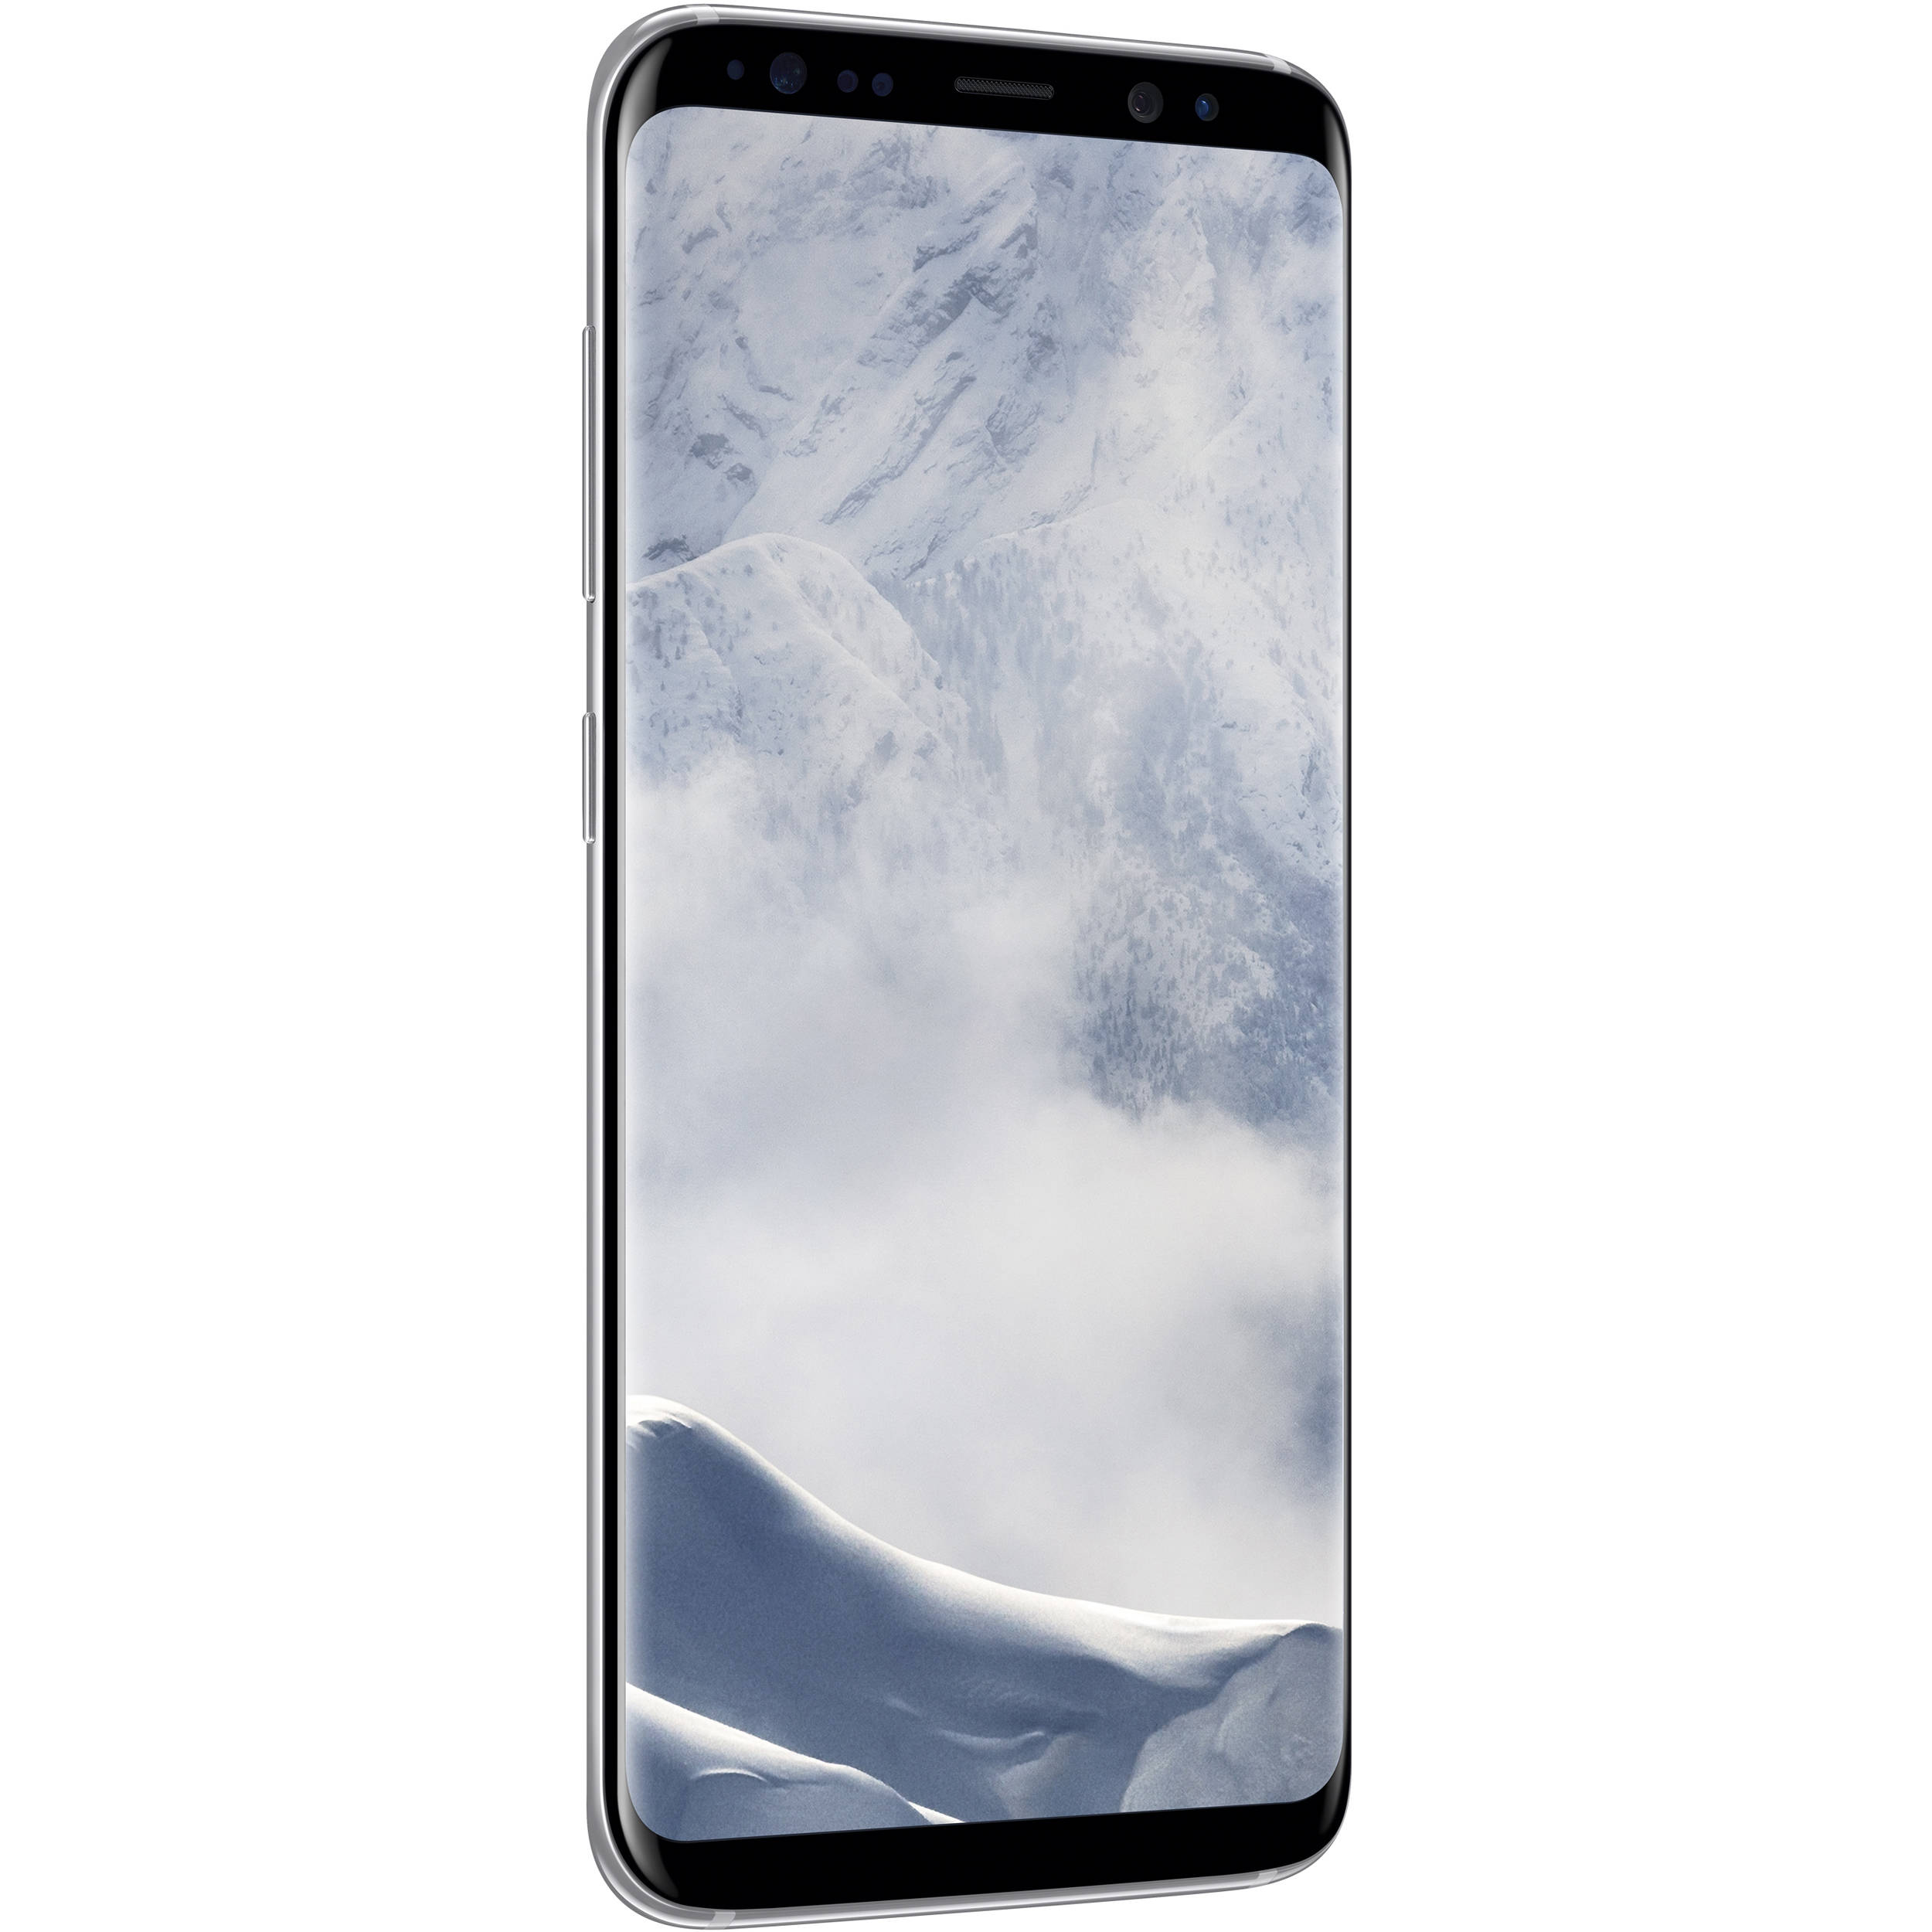 Samsung Galaxy S8 SM-G950F 64GB Smartphone (Unlocked, Arctic Silver)